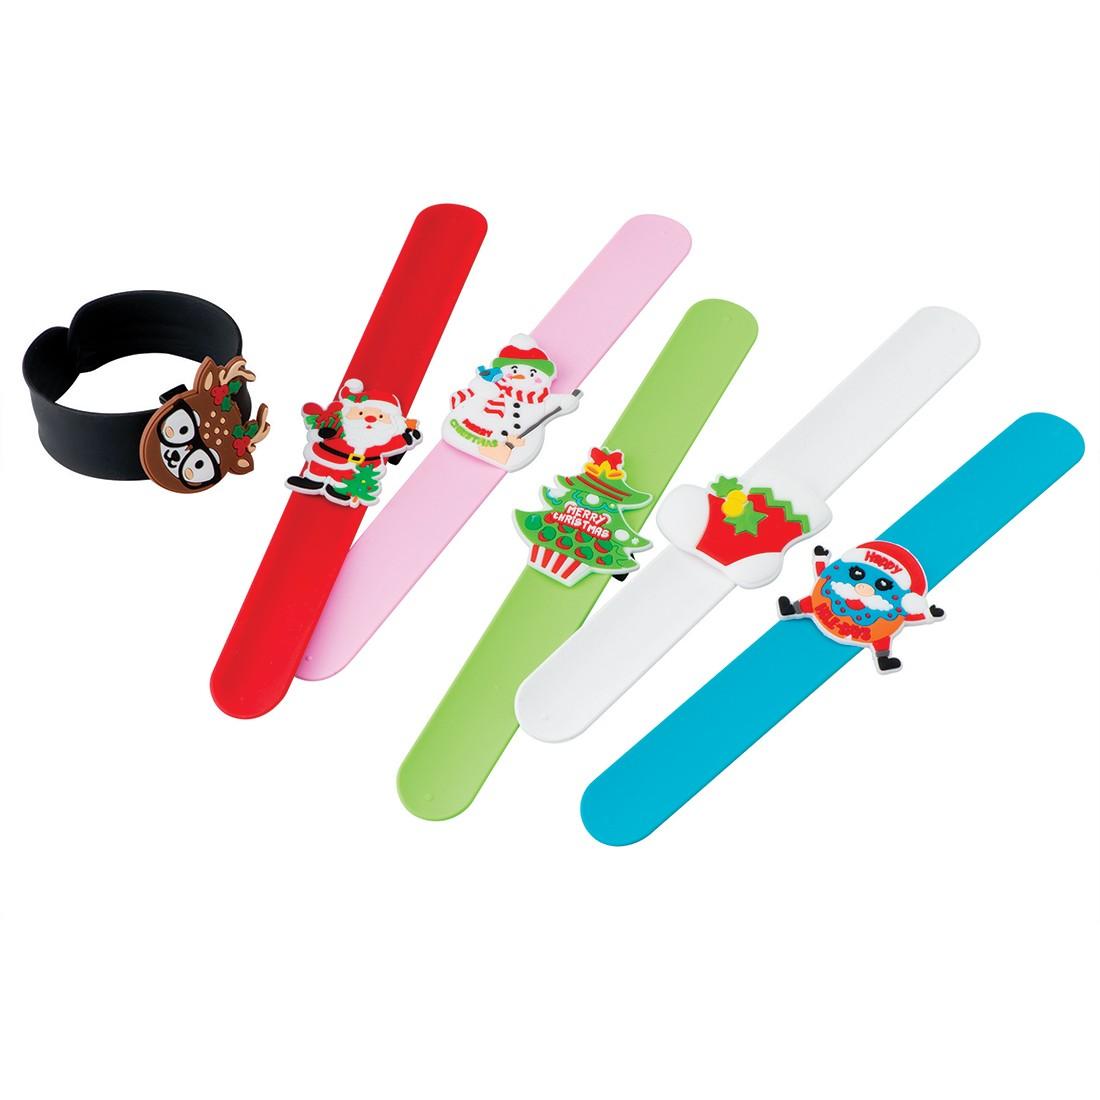 Christmas Slap Bracelets [image]